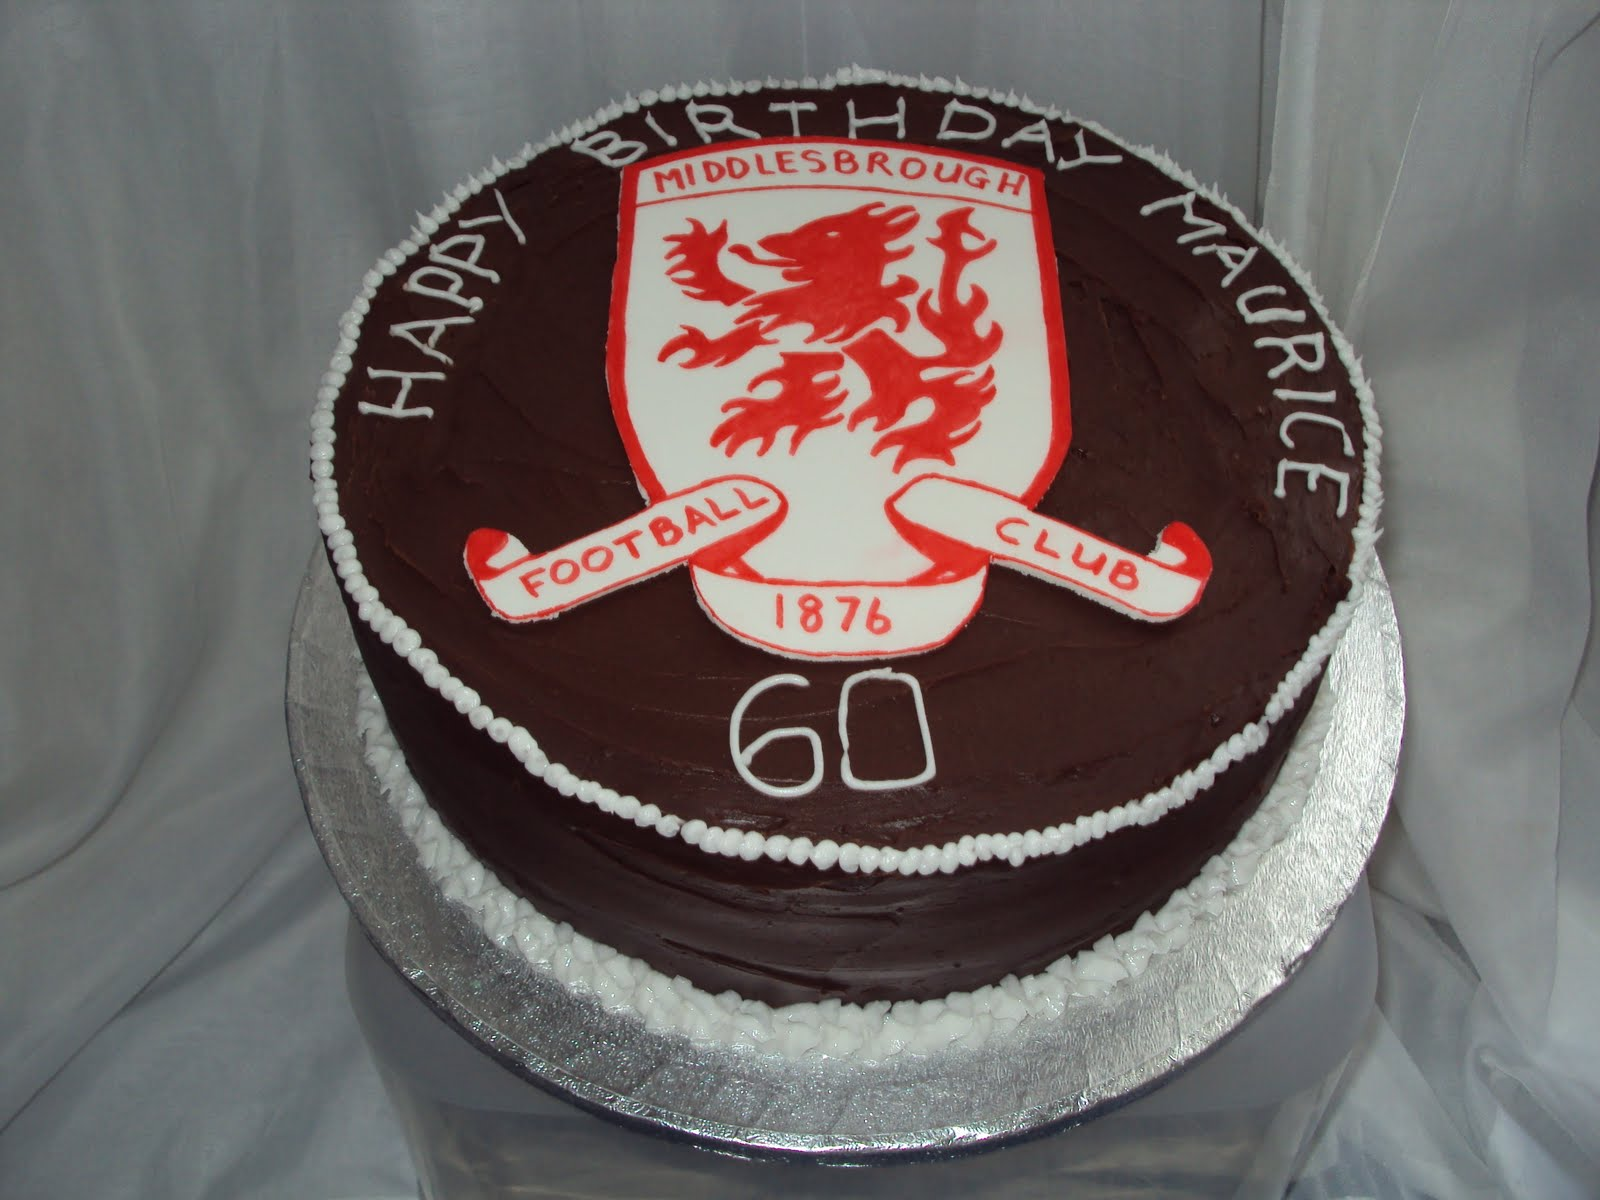 Celebration Cakes By Christine Large 10 Chocolate Truffle Birthday